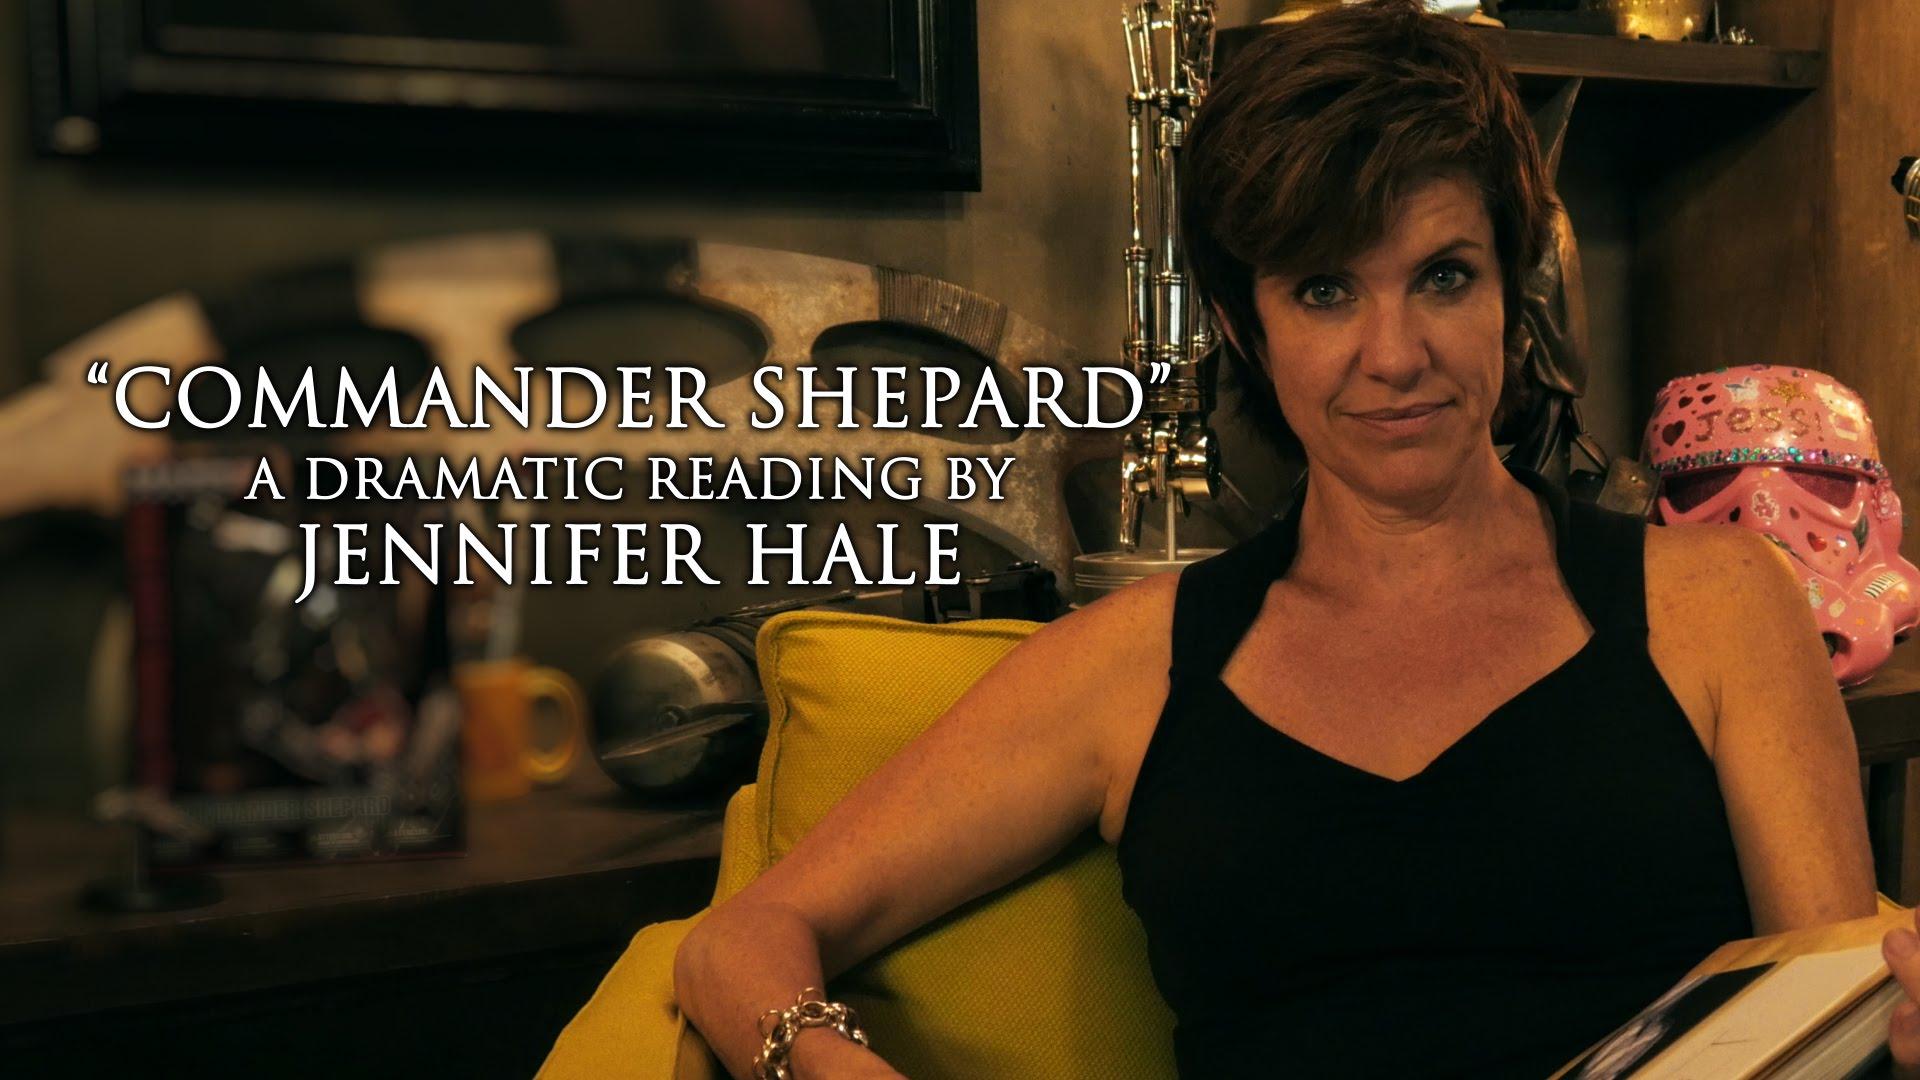 maxresdefault087Z51AN Mass Effect: A Dramatic Reading of Commander Shepard by Jennifer Hale